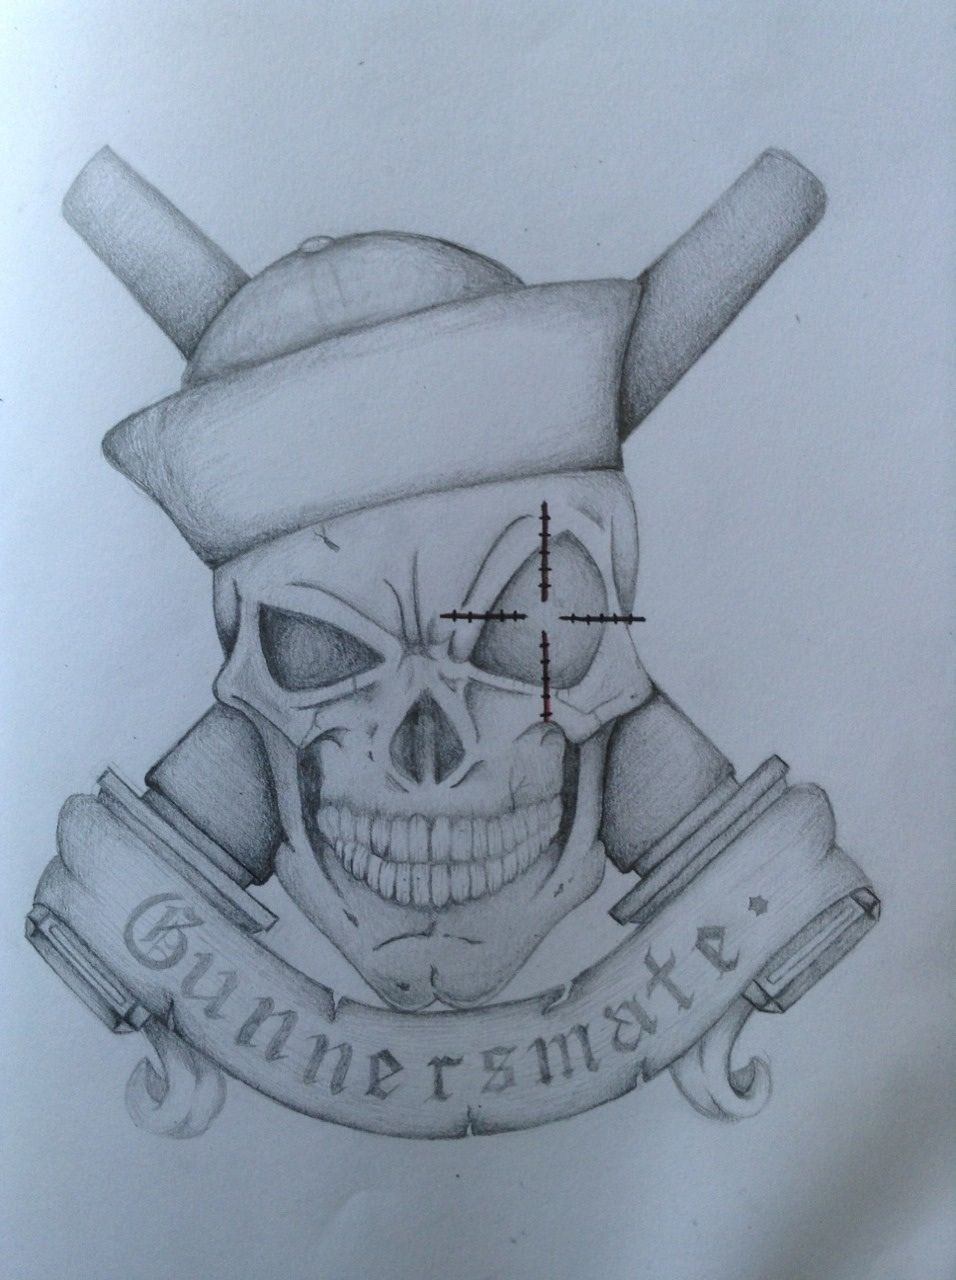 Gunners mate symbol navy gunnersmate symbol by greatlygeeky gunners mate symbol navy gunnersmate symbol by greatlygeeky biocorpaavc